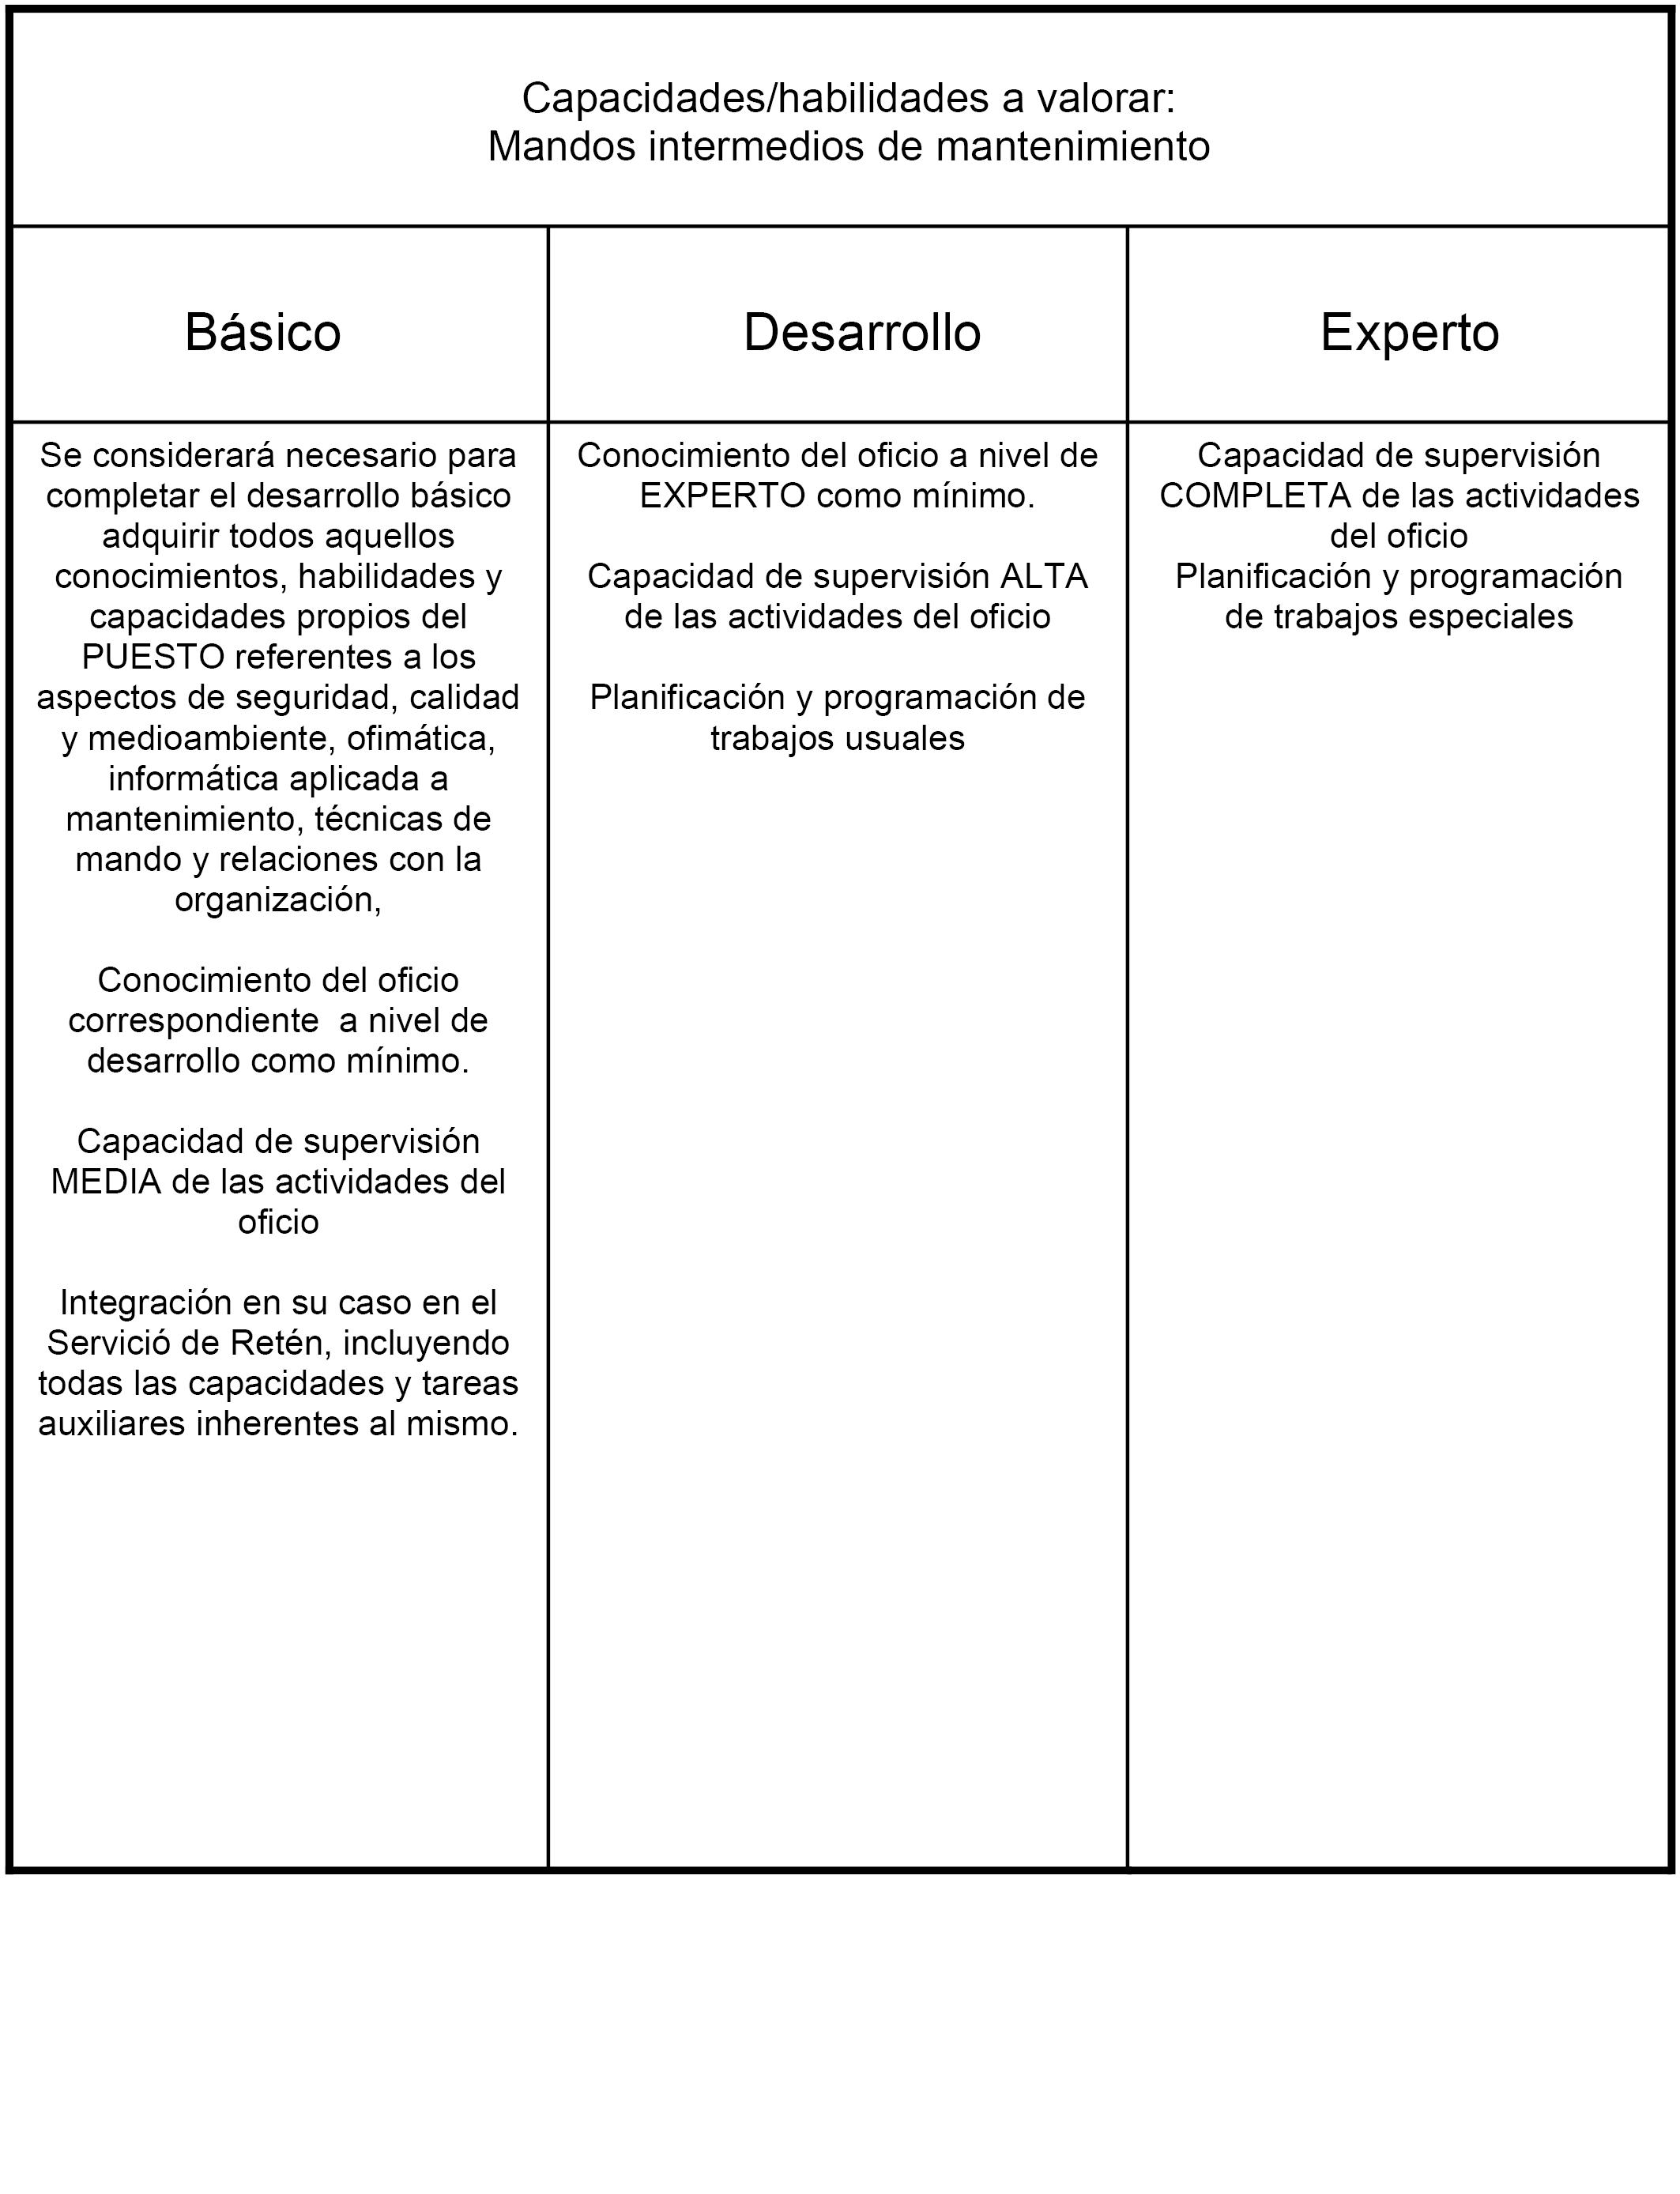 BOE.es - Documento BOE-A-2018-9155